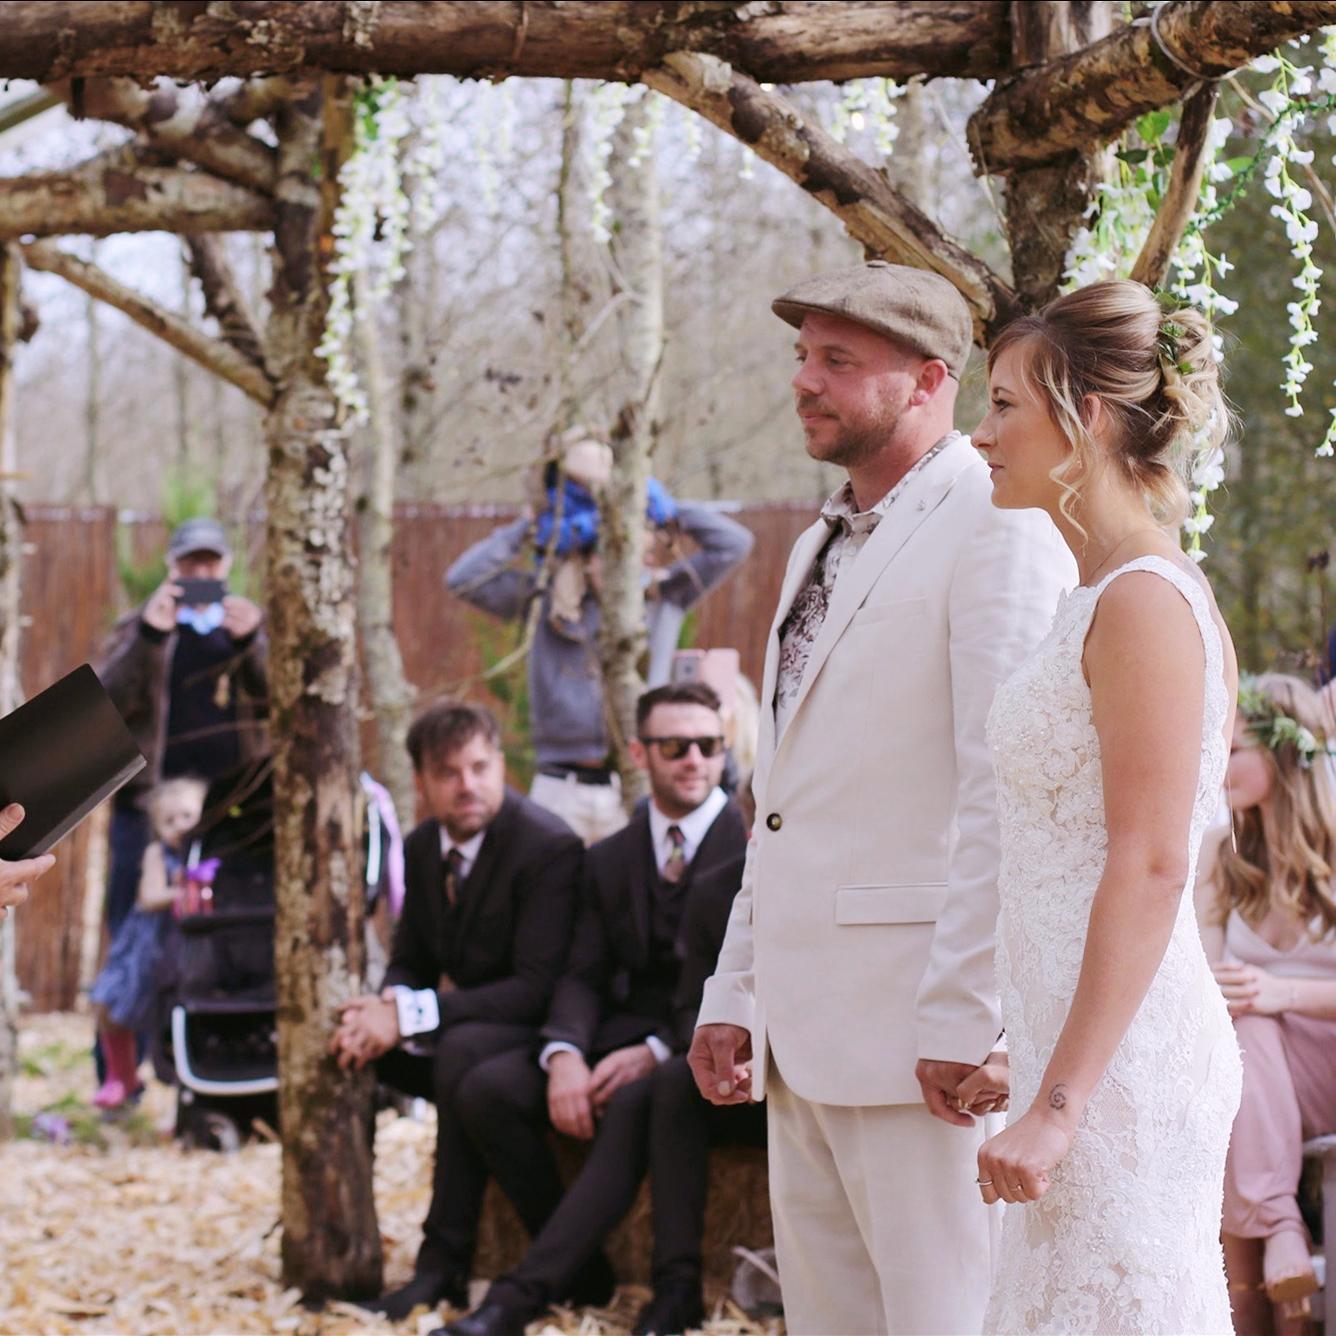 Weddings_In_The_Wyldes_treebar.jpeg